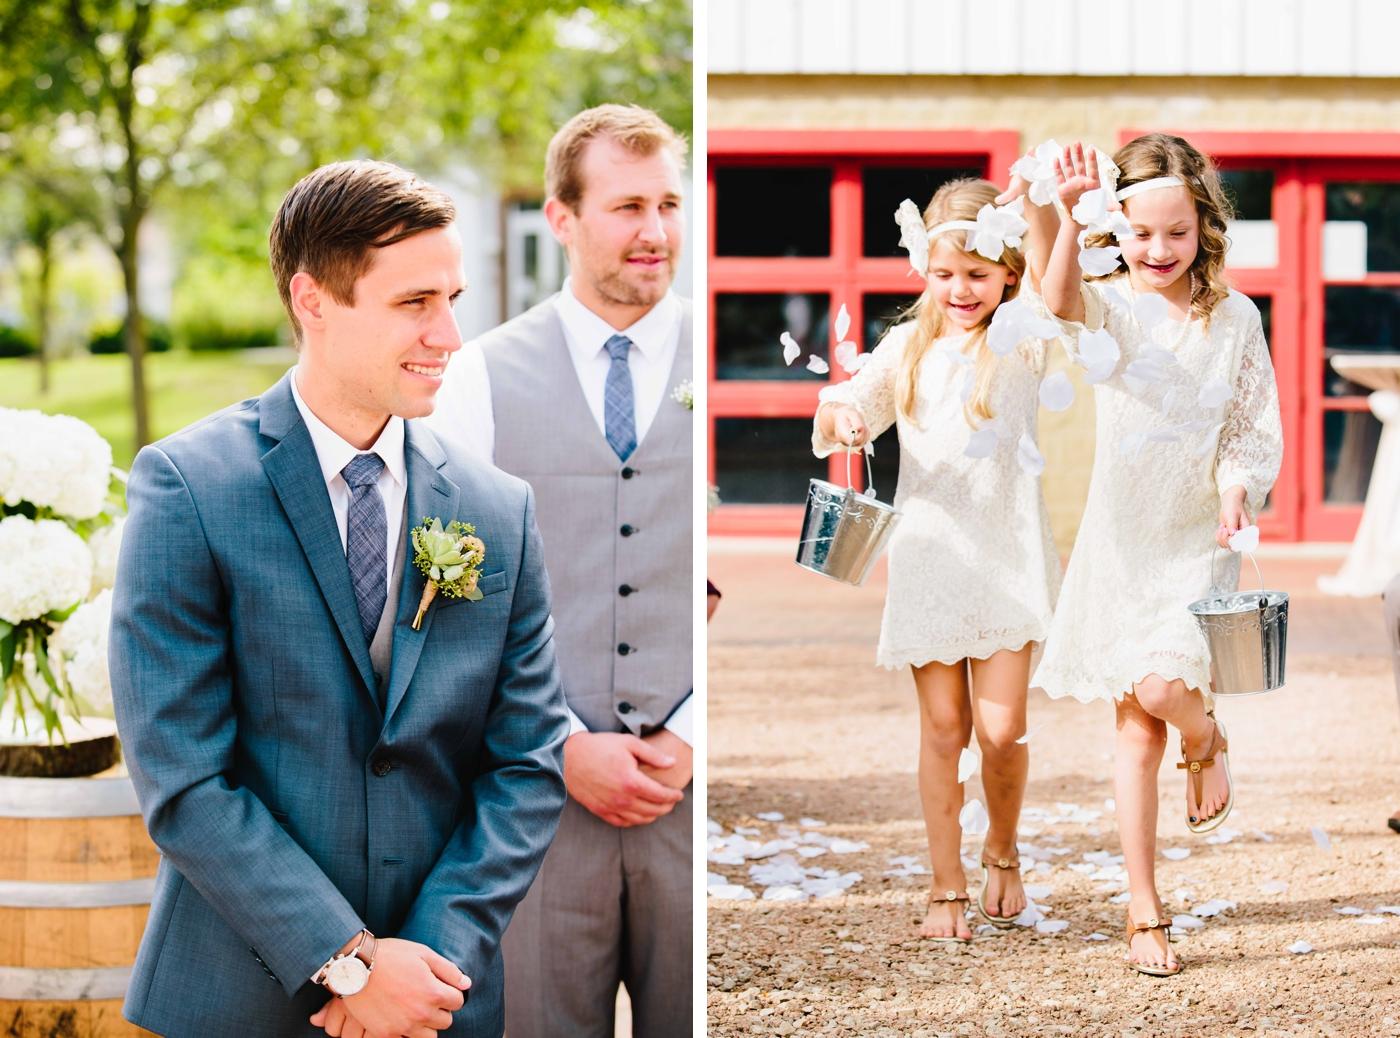 chicago-fine-art-wedding-photography-chiapetta23